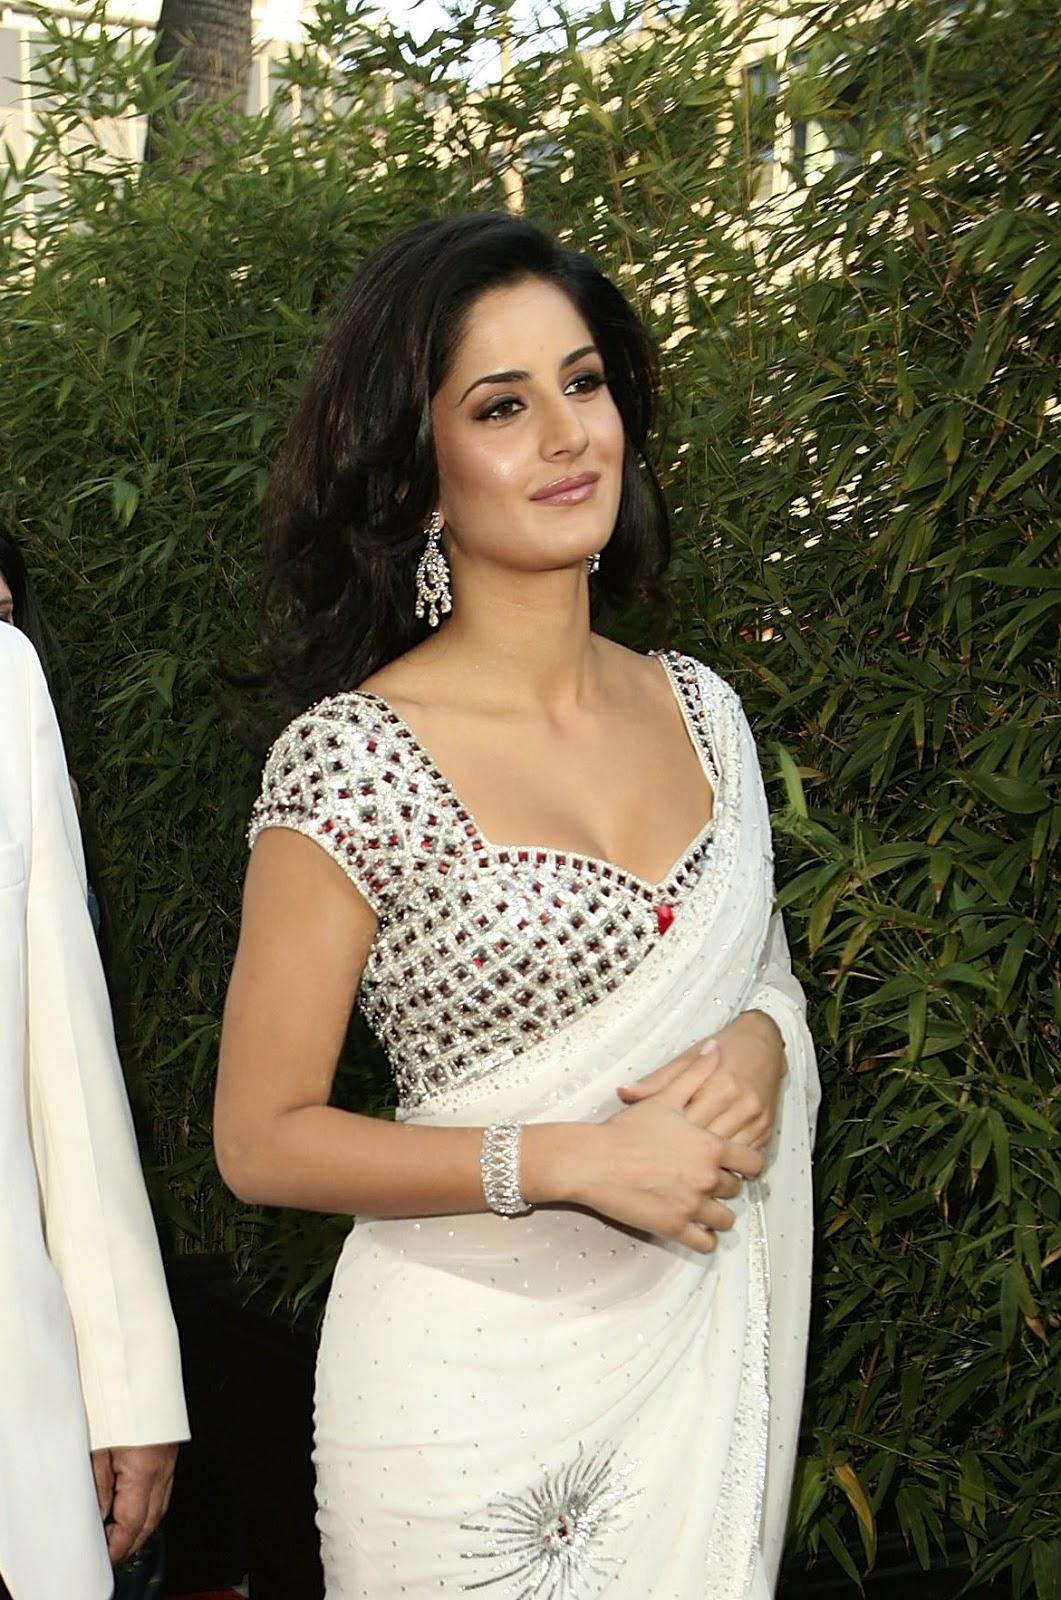 Katrina Kaif Sexiest Cleavage Show In Saree - Hd Latest -1840